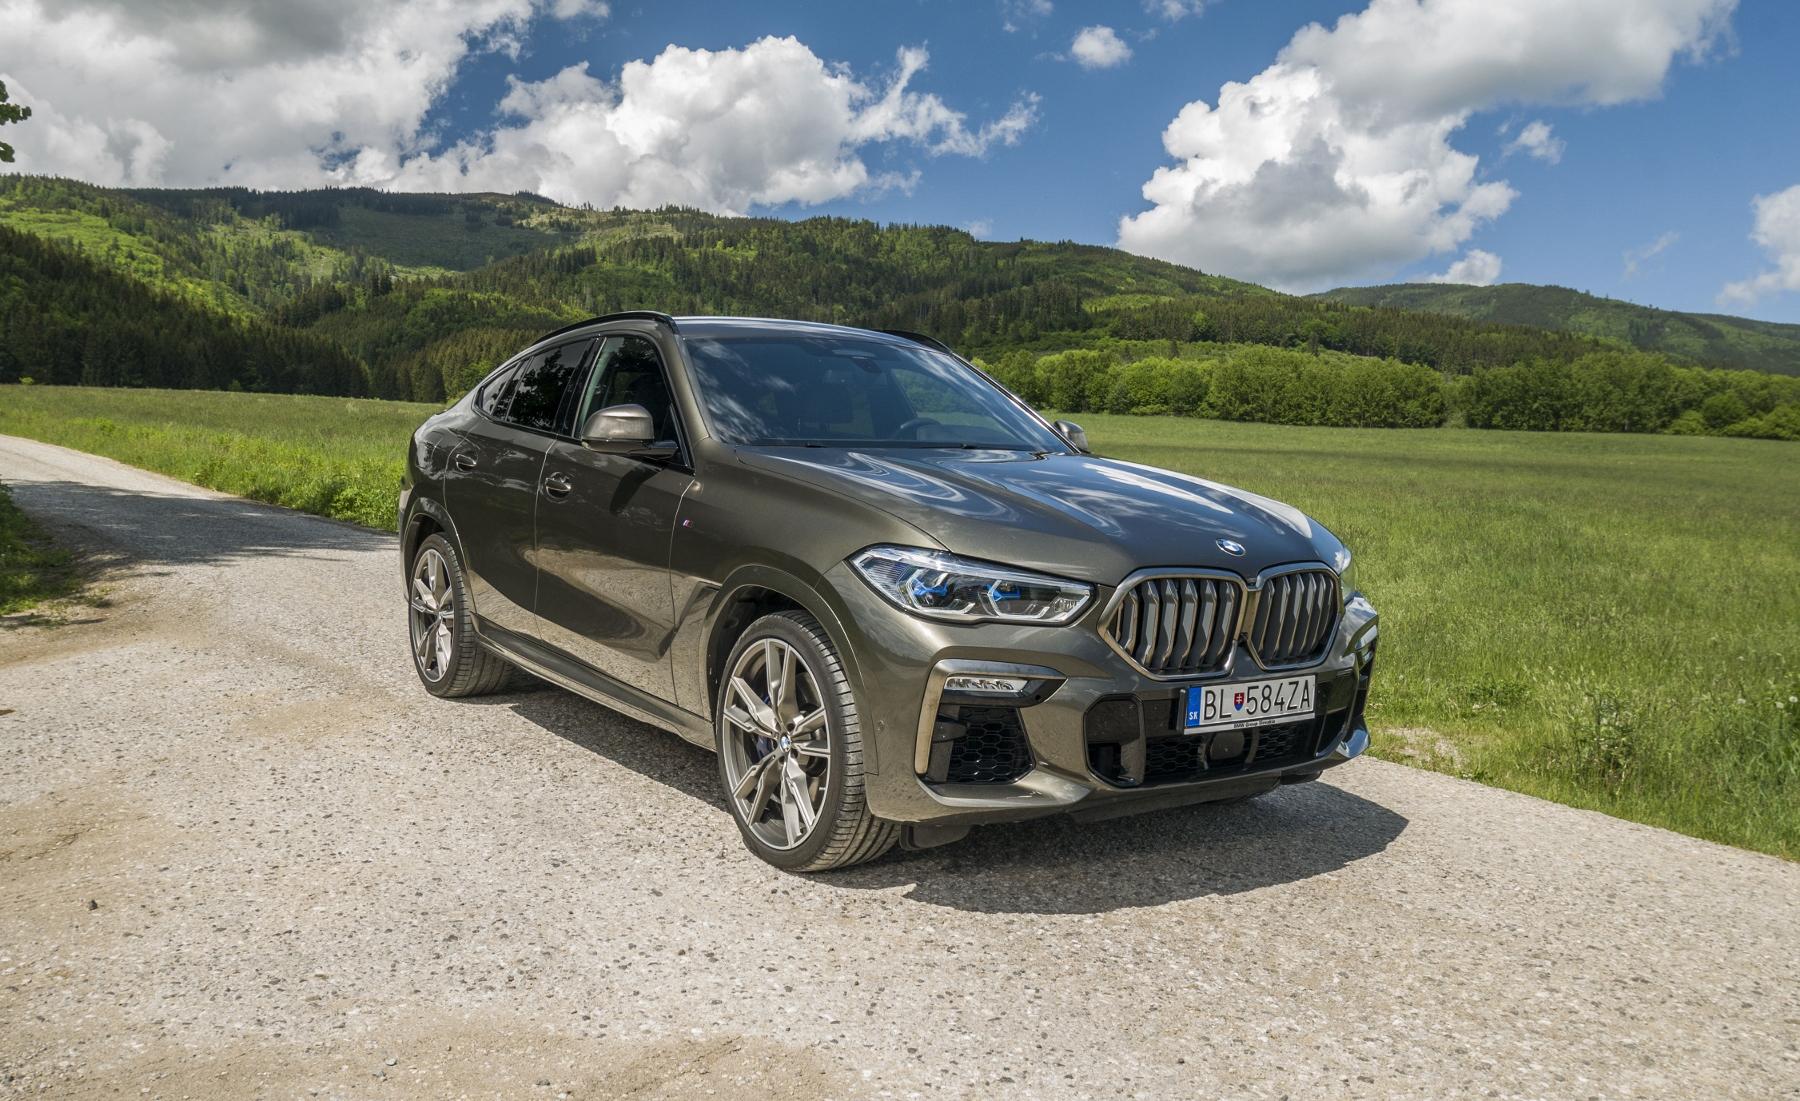 Test: BMW X6 M50i napína benzínové svaly, ale neukazuje plnú silu 9zVeZ1lkti bmw-x6-m50i-3